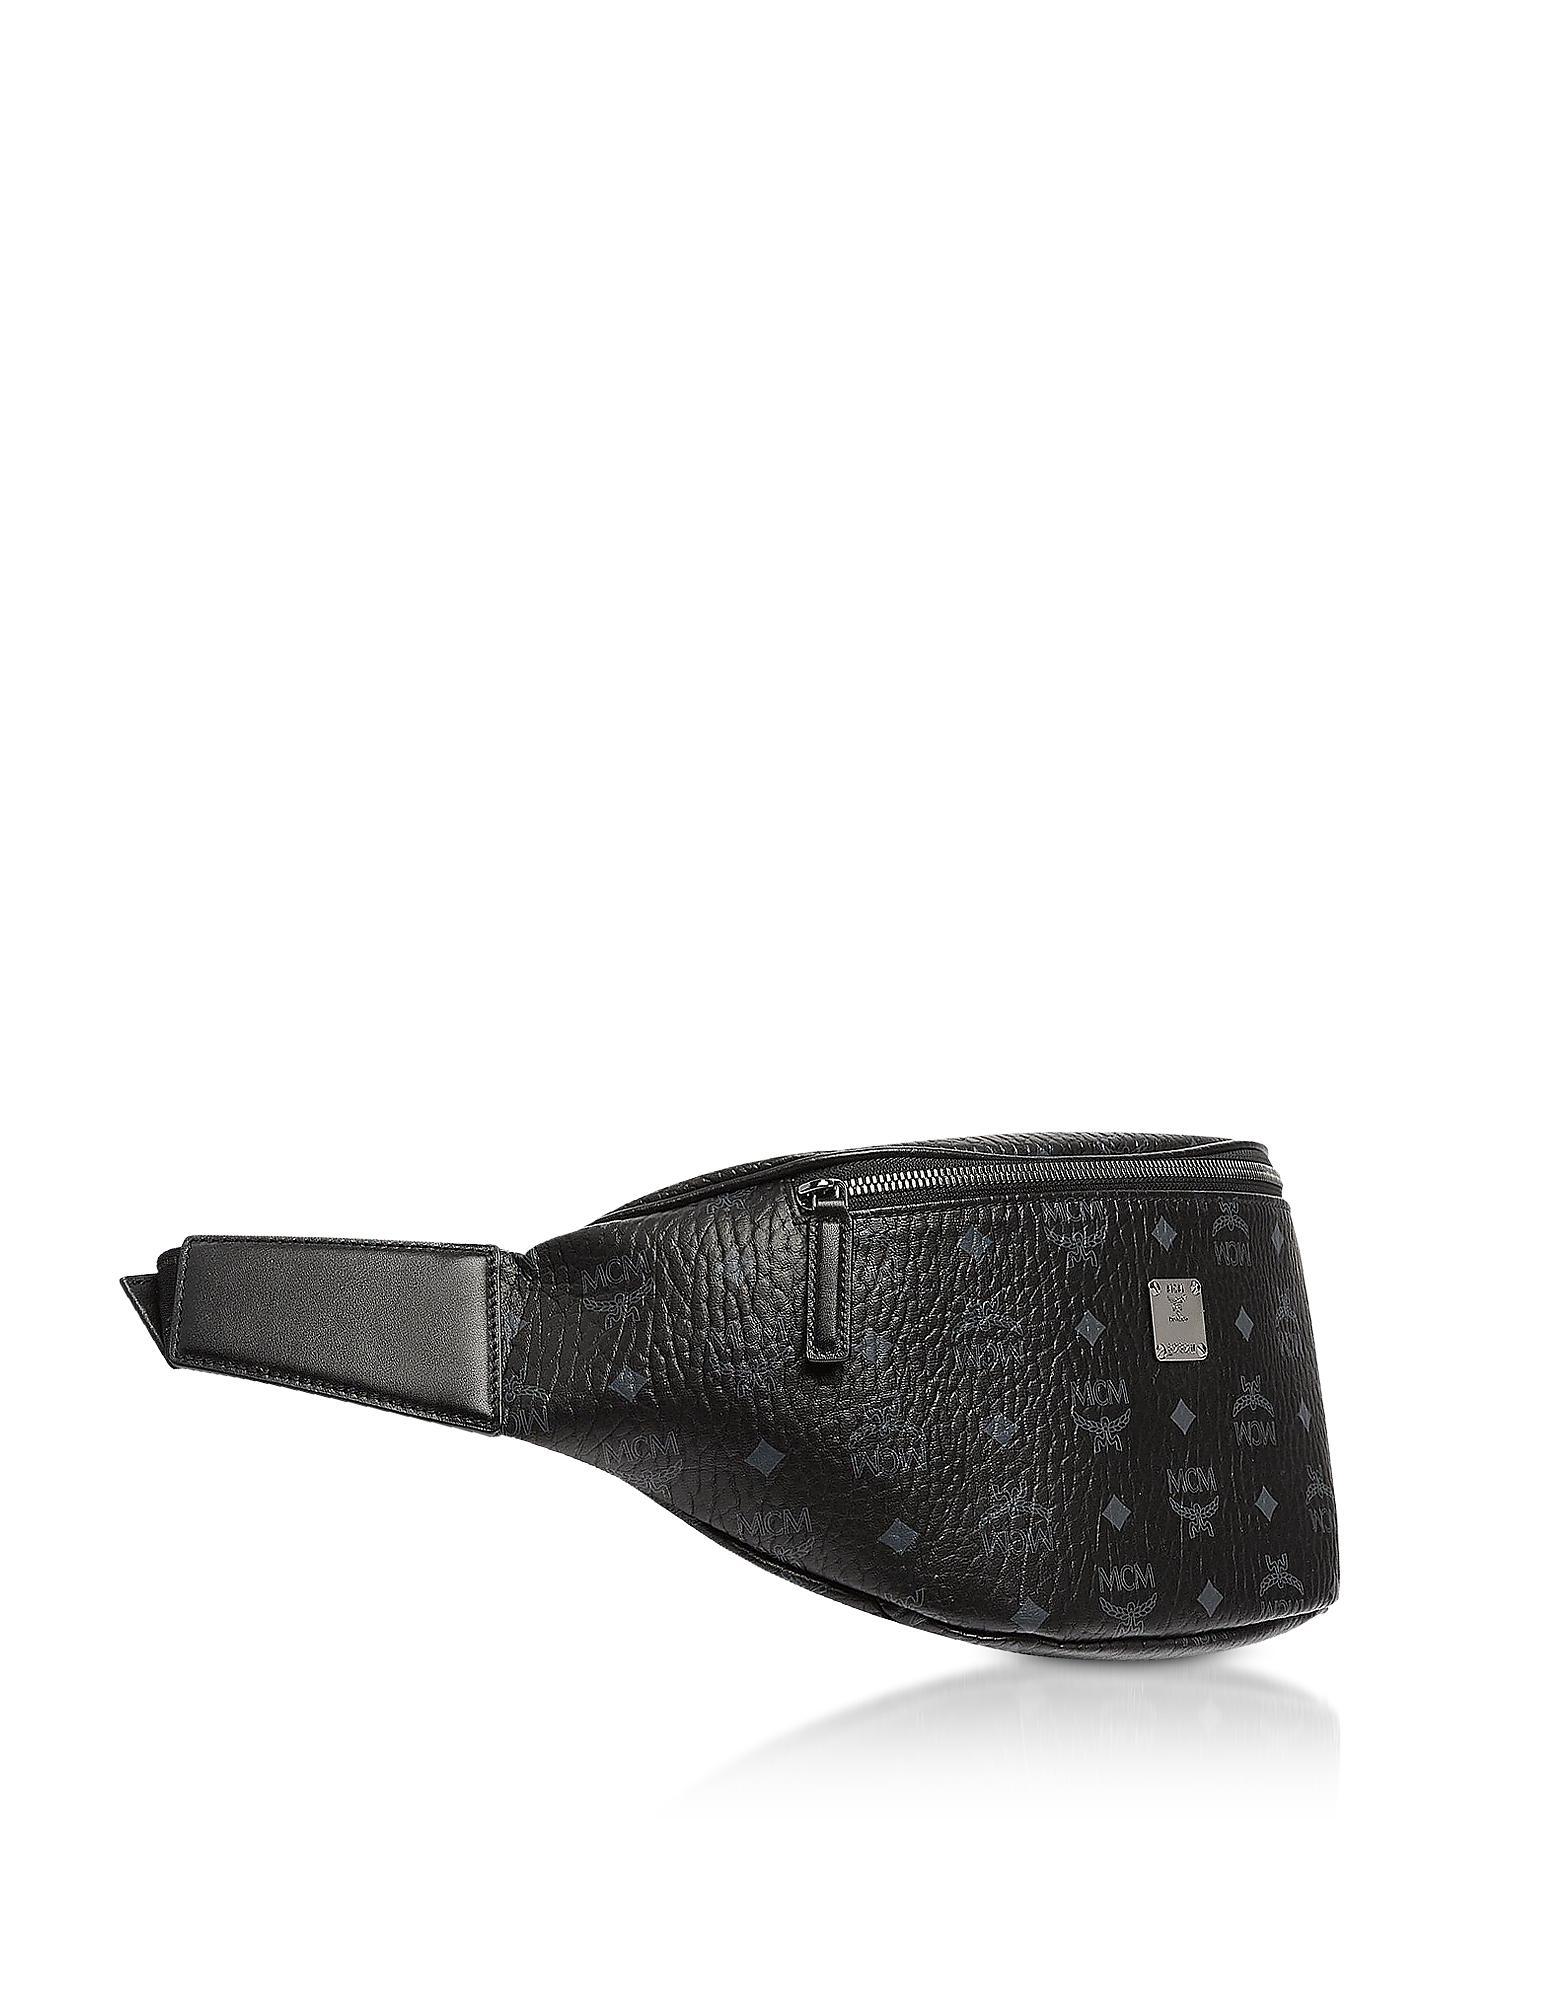 57f7a56f7f4 MCM Black Visetos Medium Stark Belt Bag for men